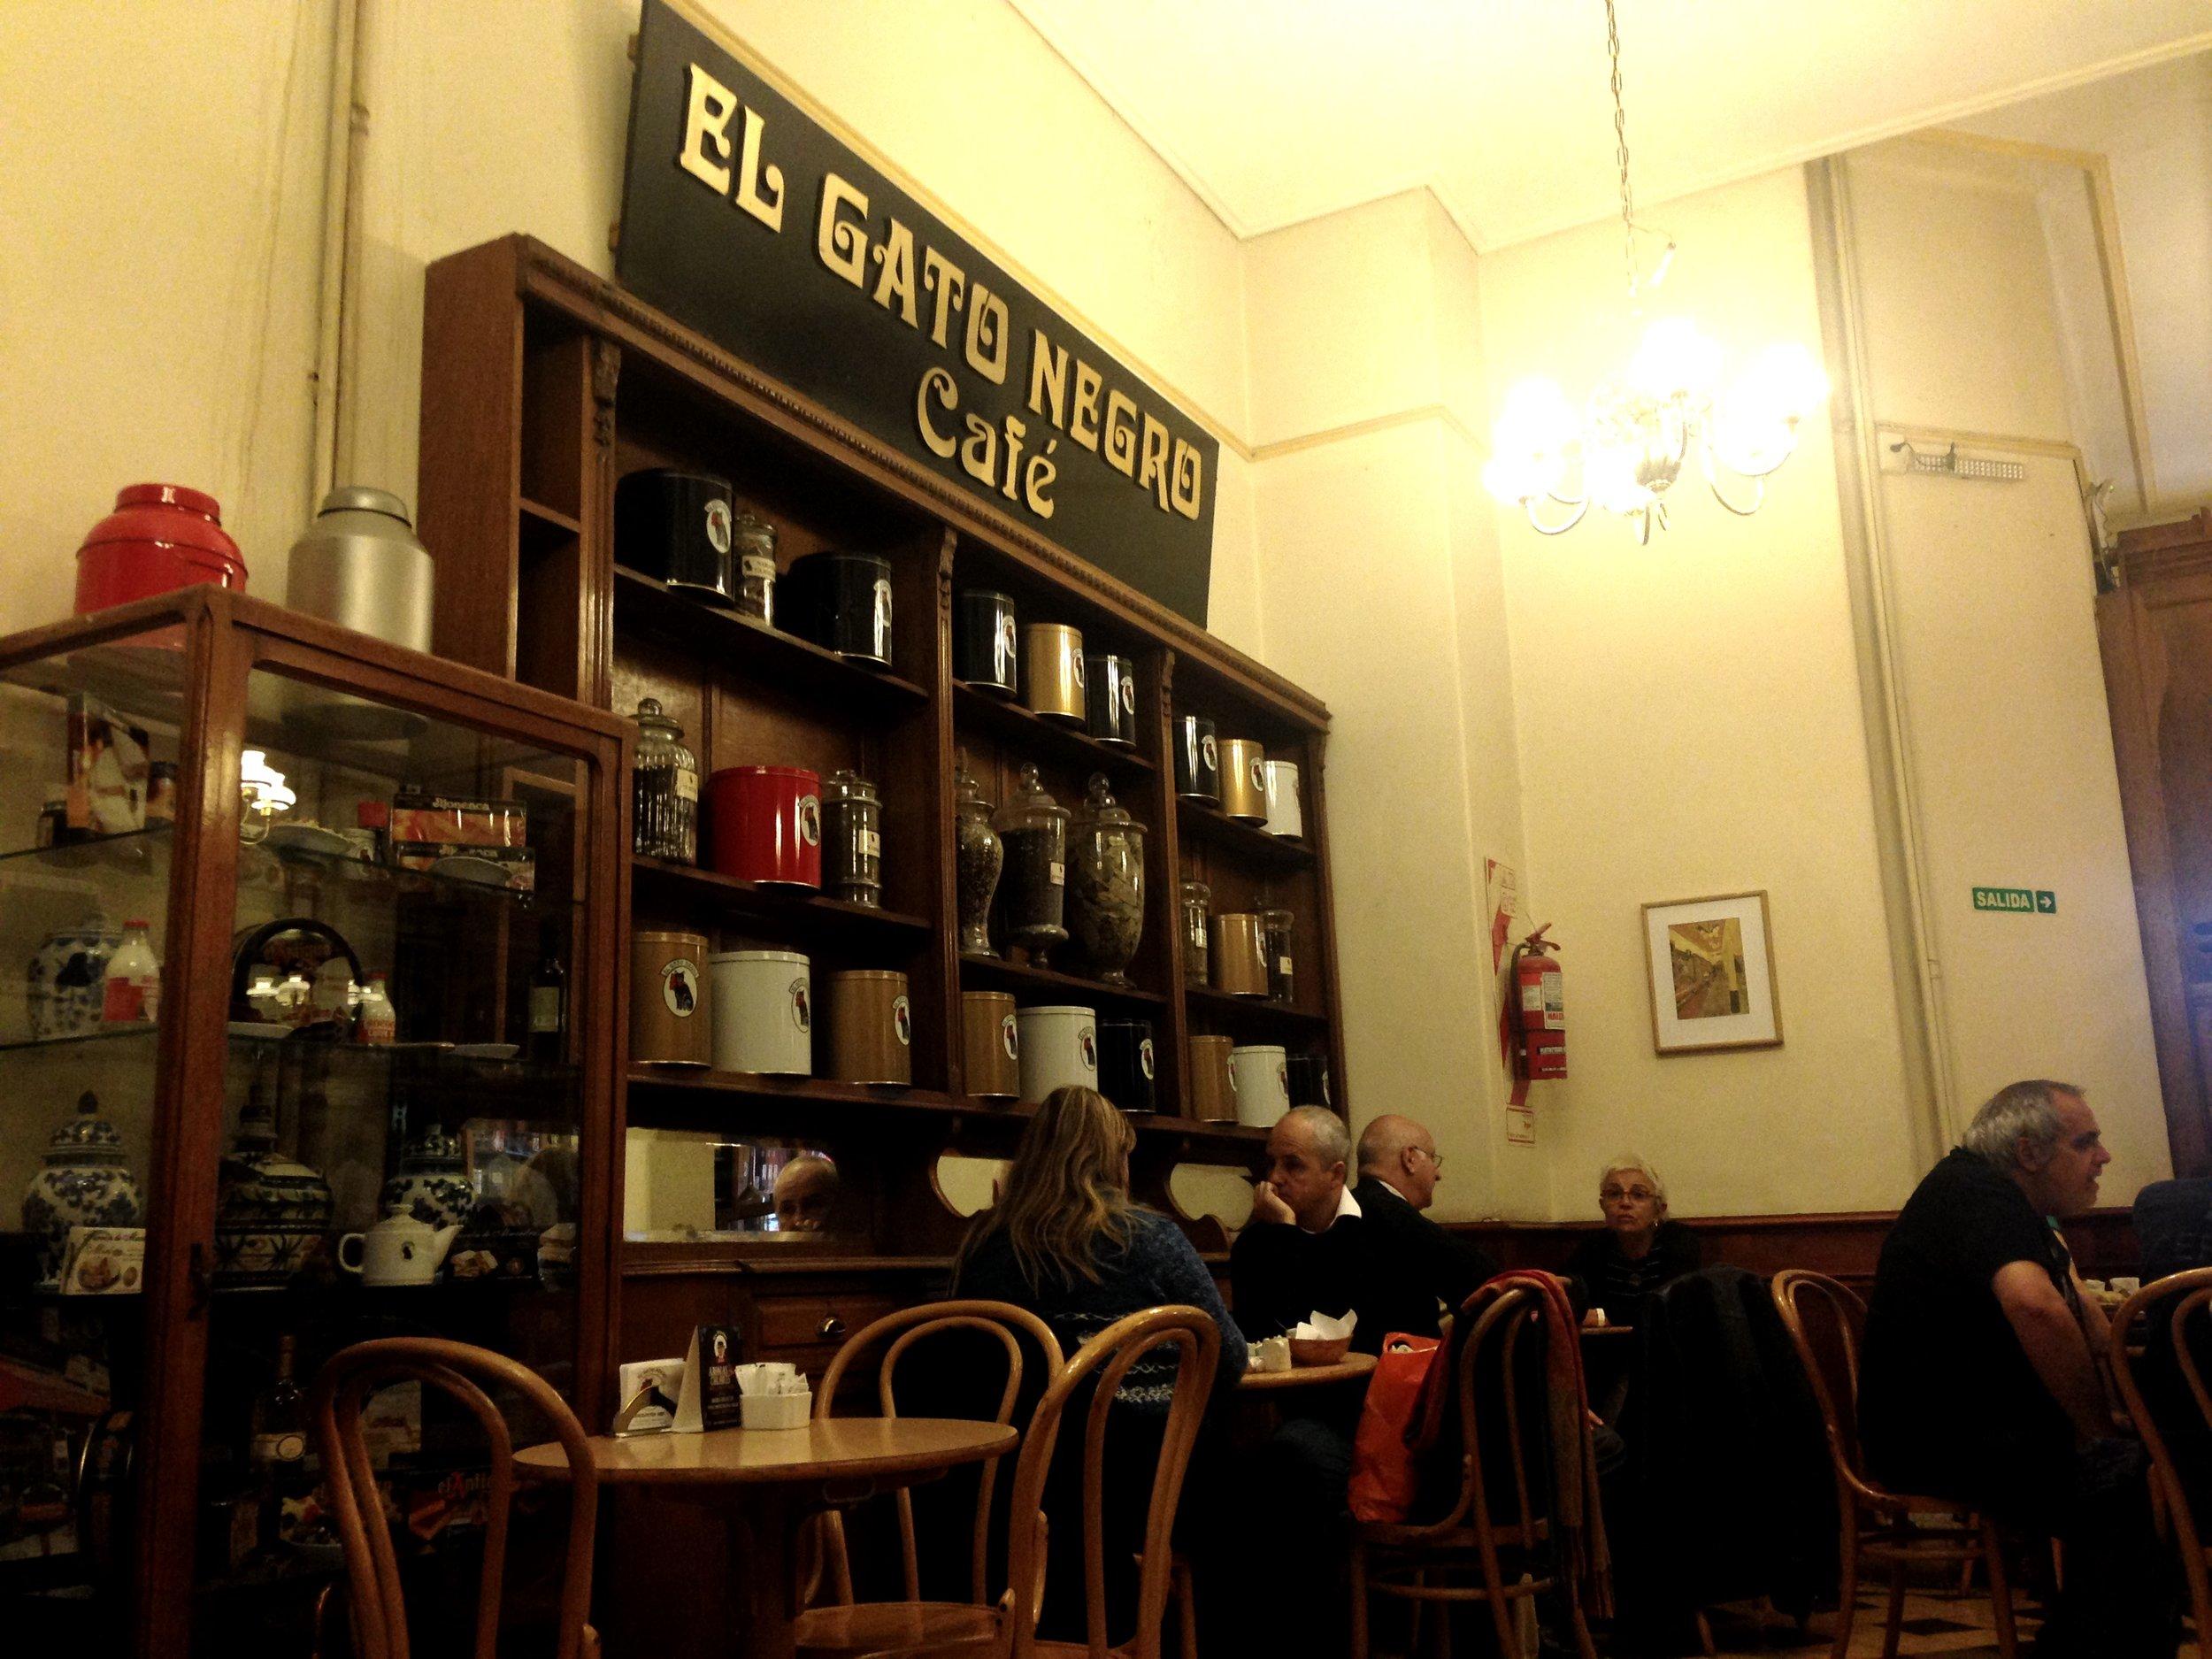 El Gato Negro Bar. Photo by Allison Yates